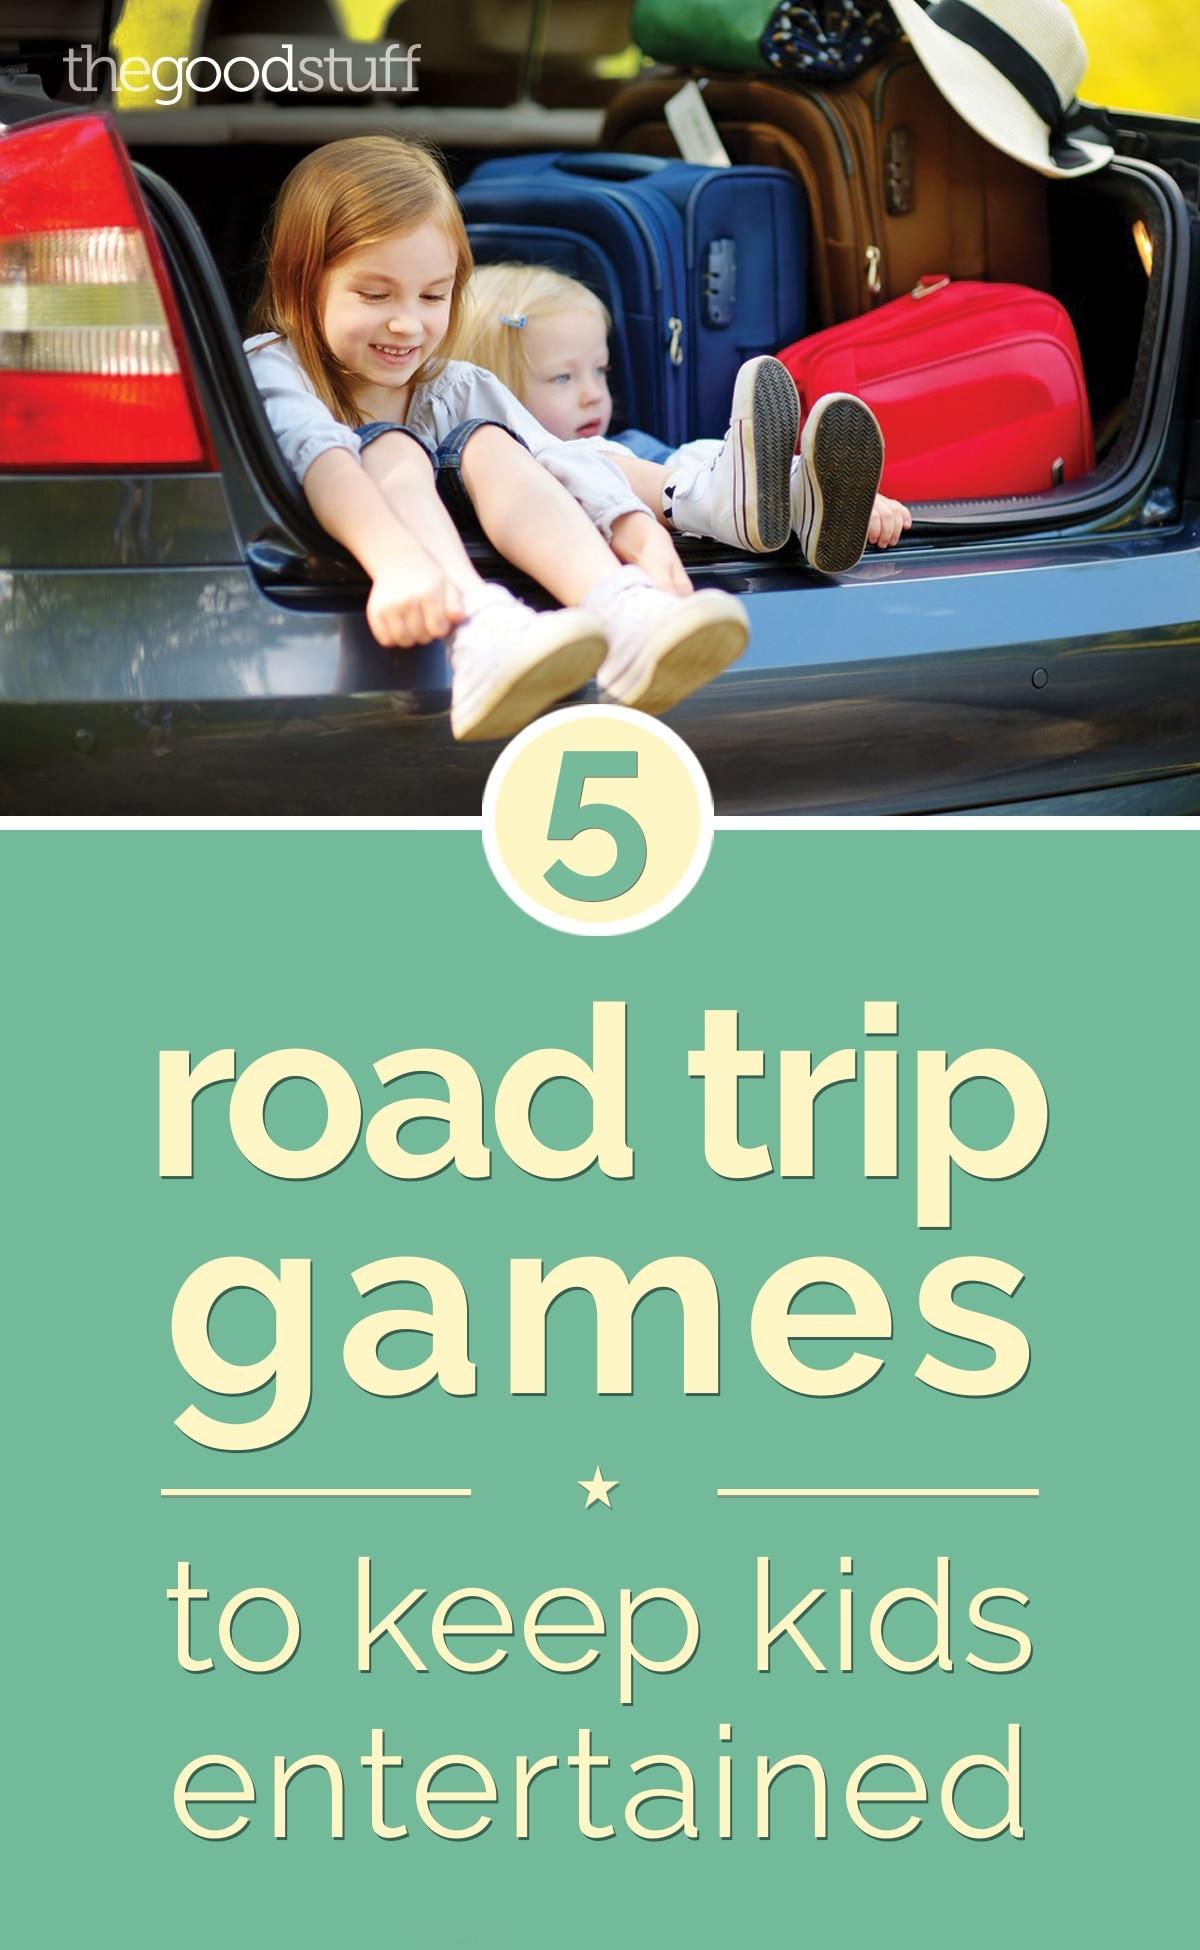 life-road-trip-games